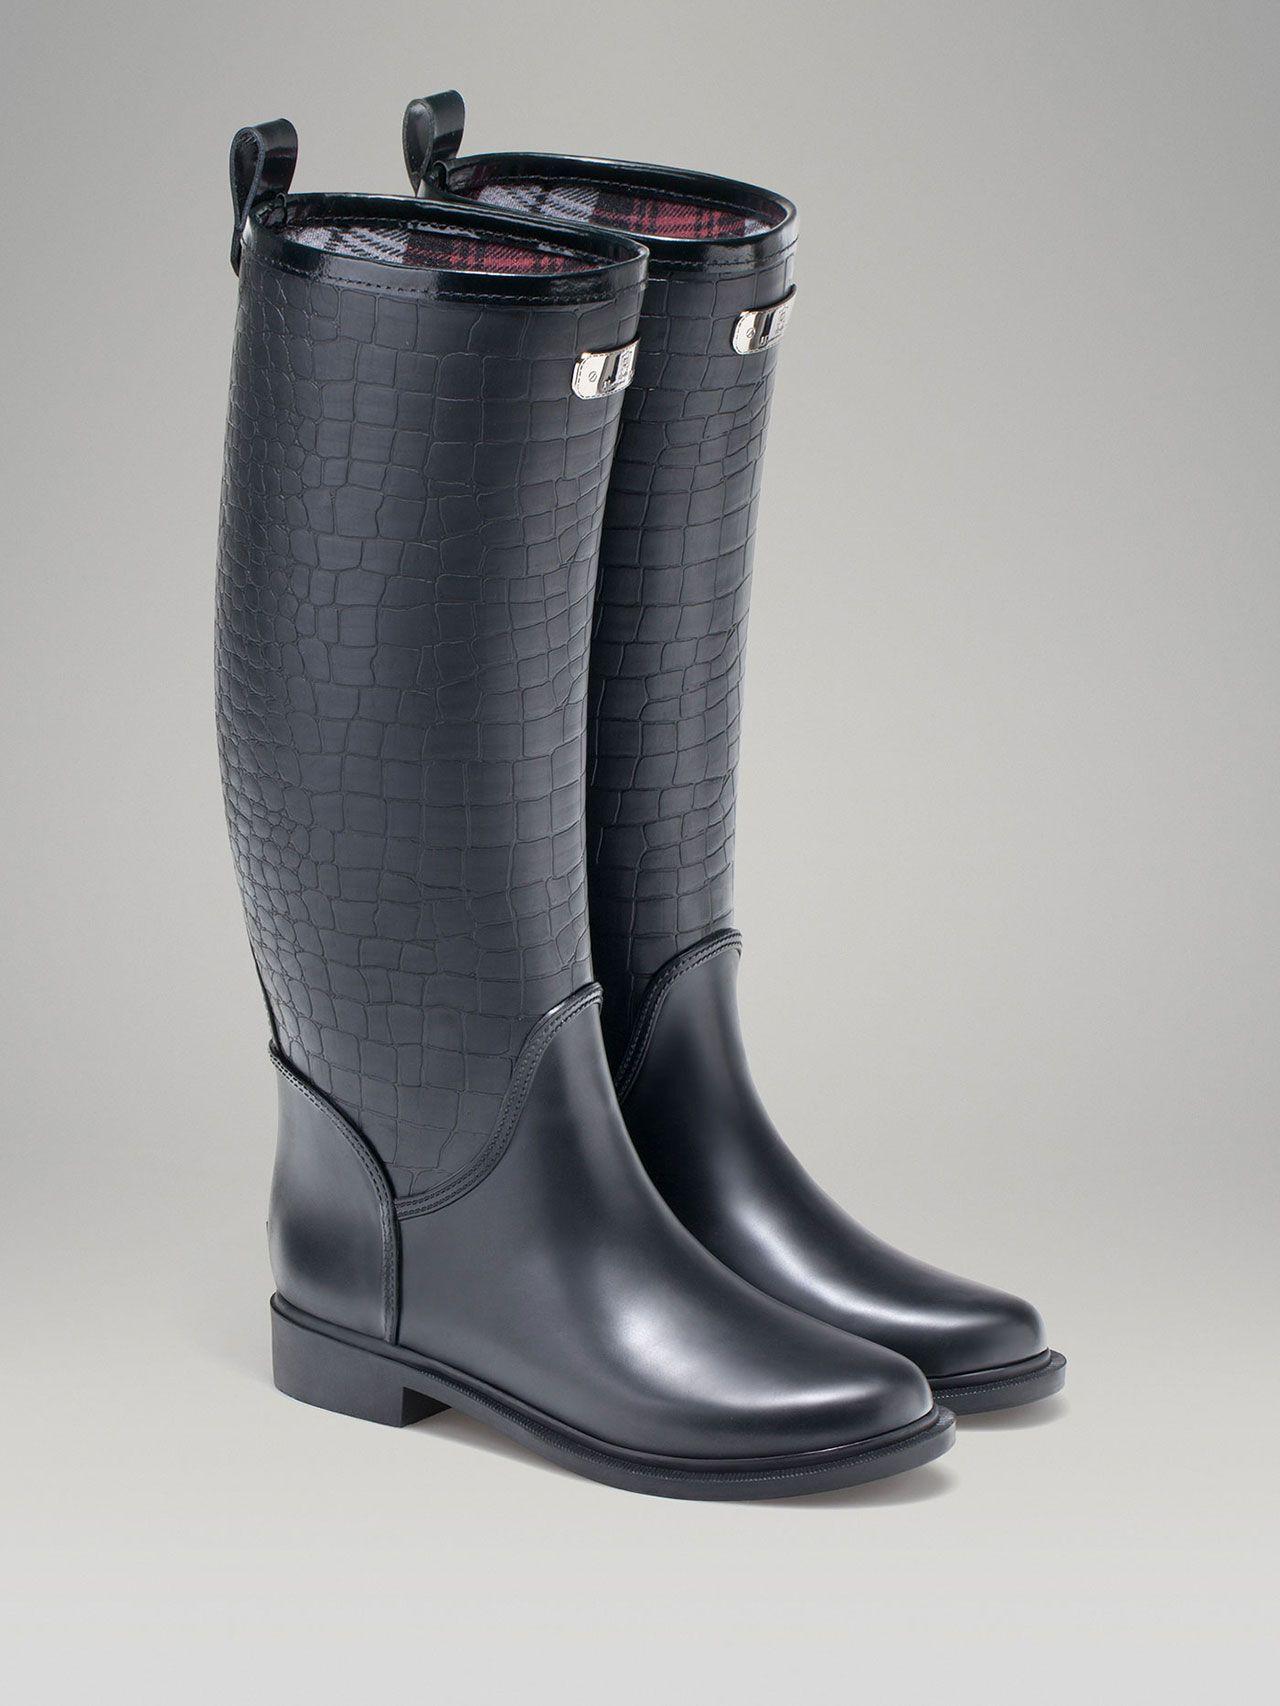 e2515f97a2e4c my rain boots. CROCODILE WELLINGTONS